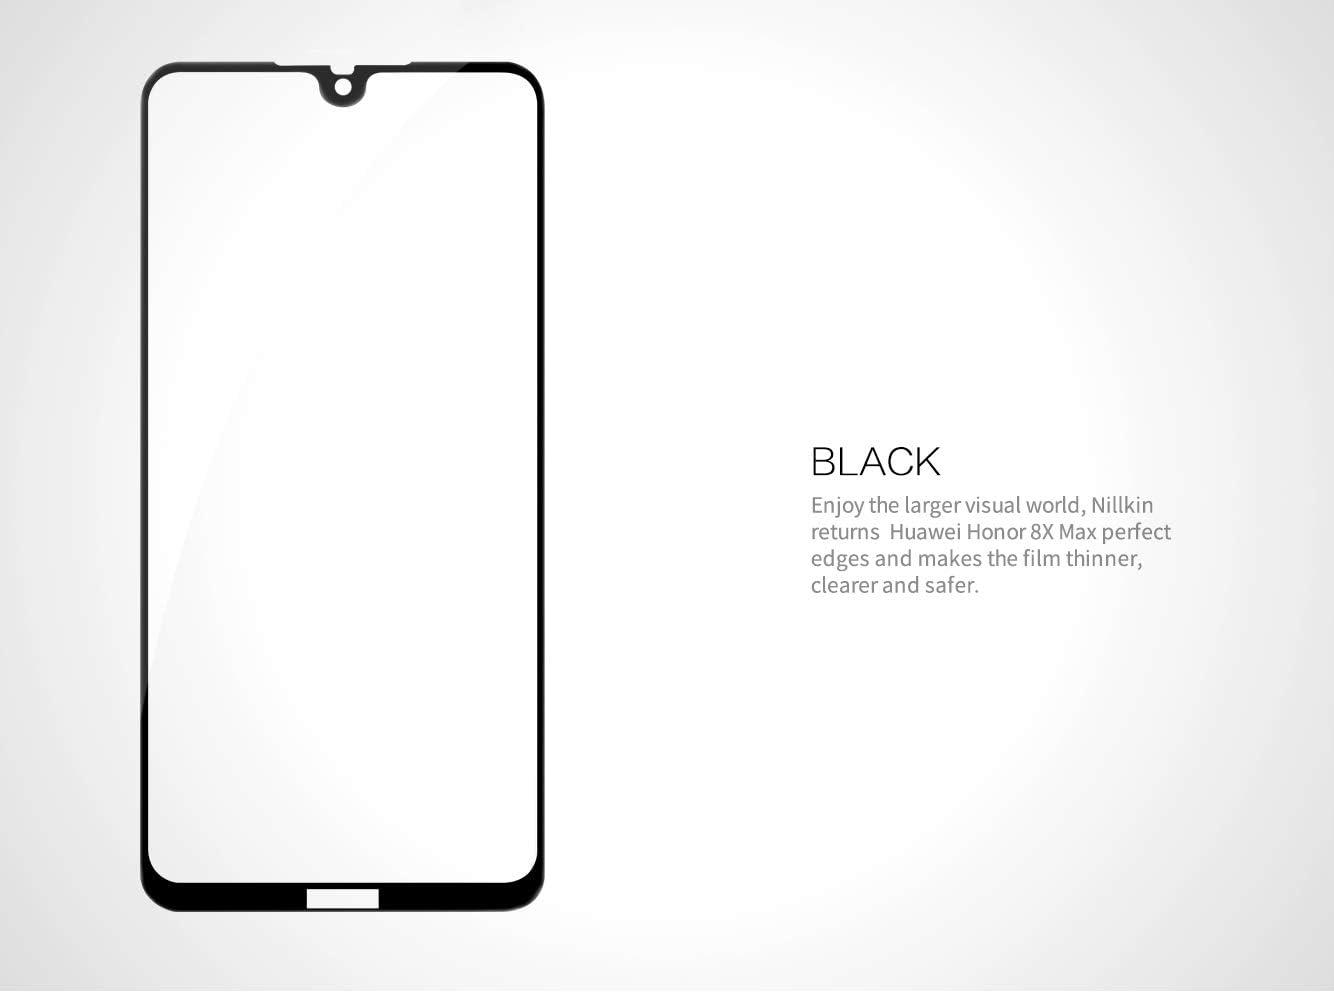 NILLKIN Amazing CP+ Huawei Honor 8X MAX: Amazon.es: Electrónica